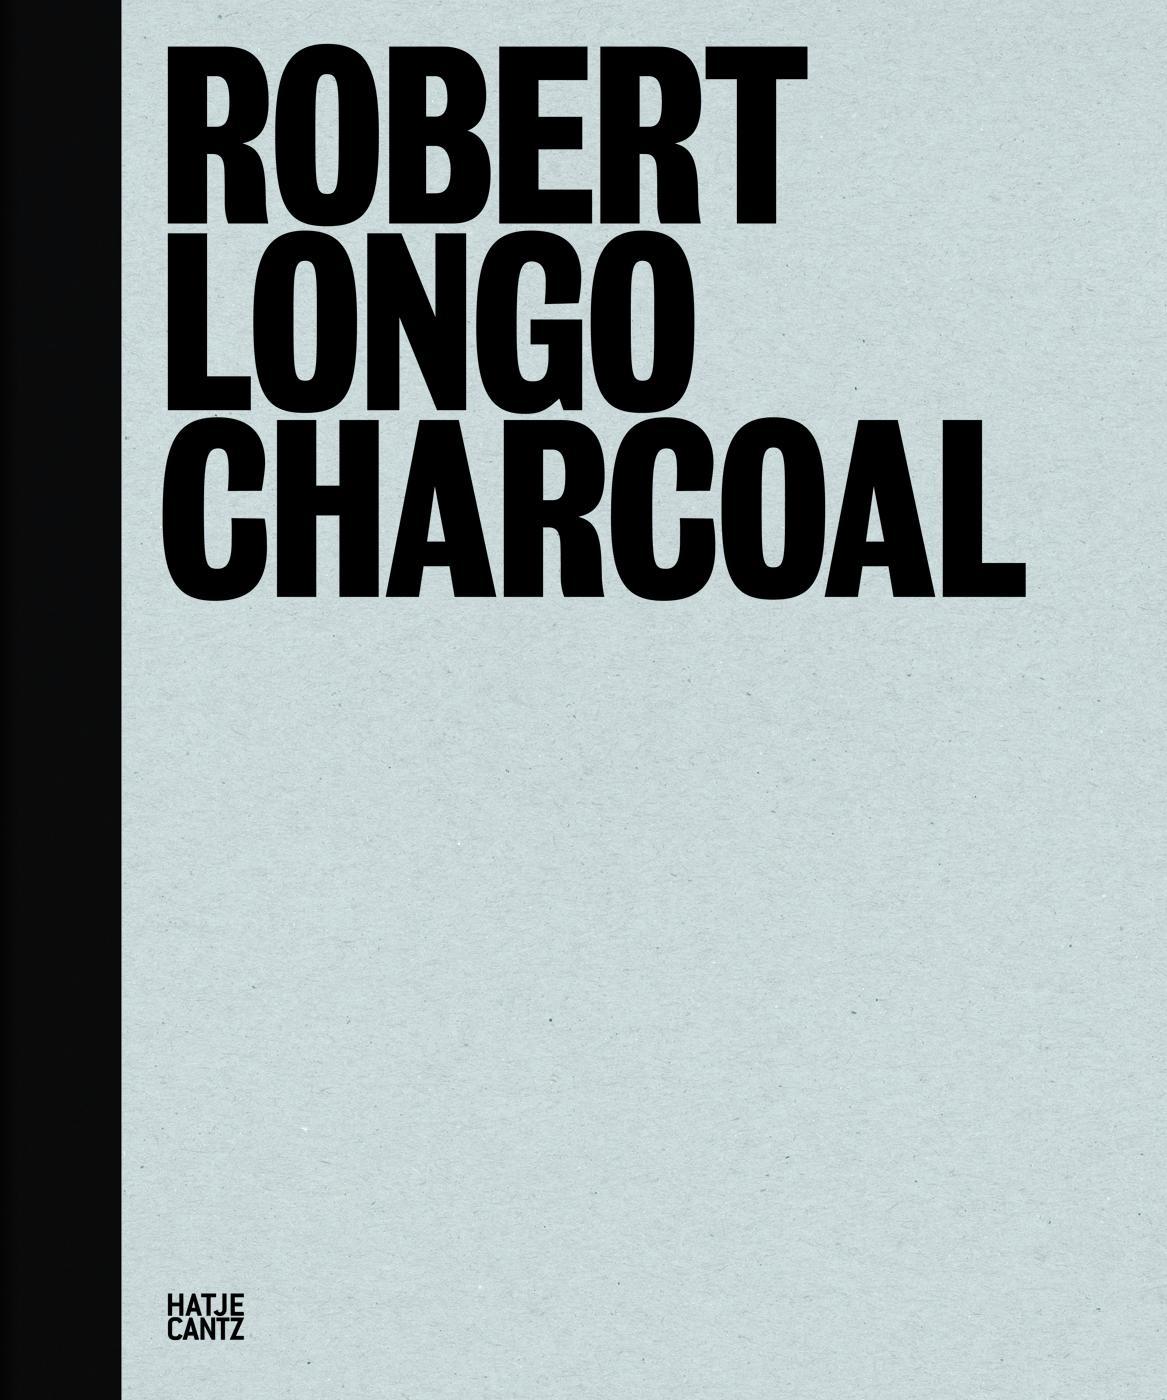 Robert Longo - Charcoal, Hal Foster